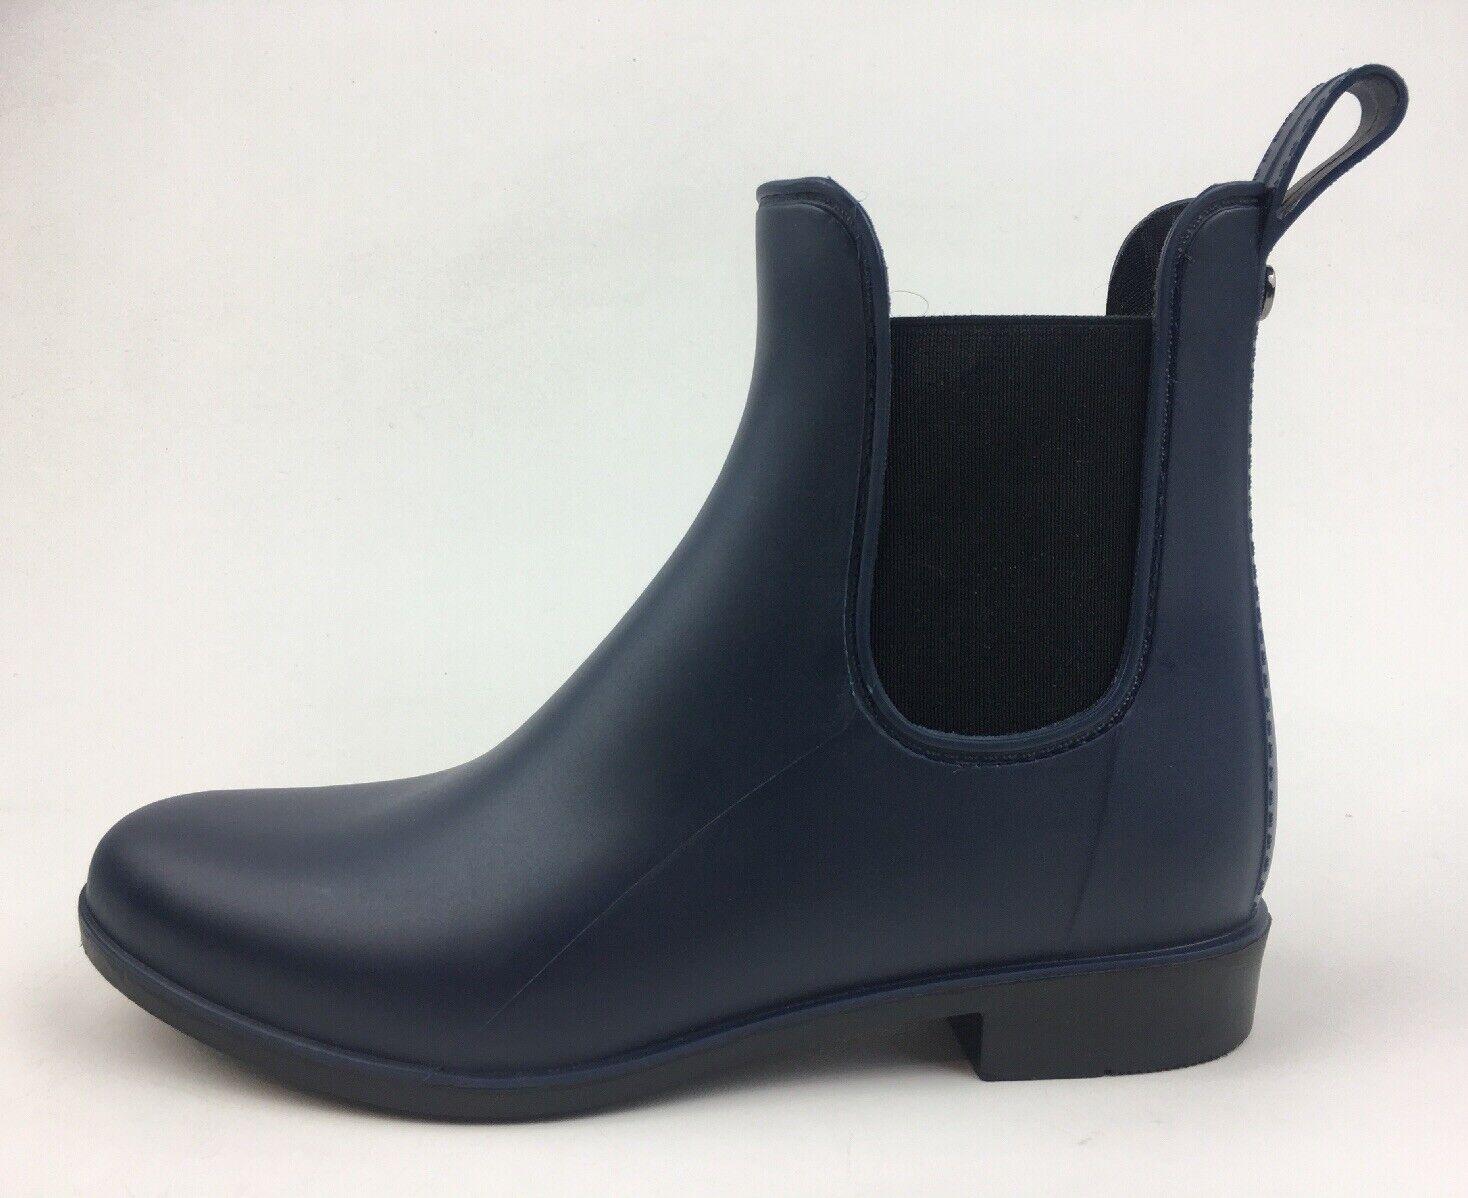 Sam Edelman Tinsley Rain Boots - Women's Size 6M, Navy 2350